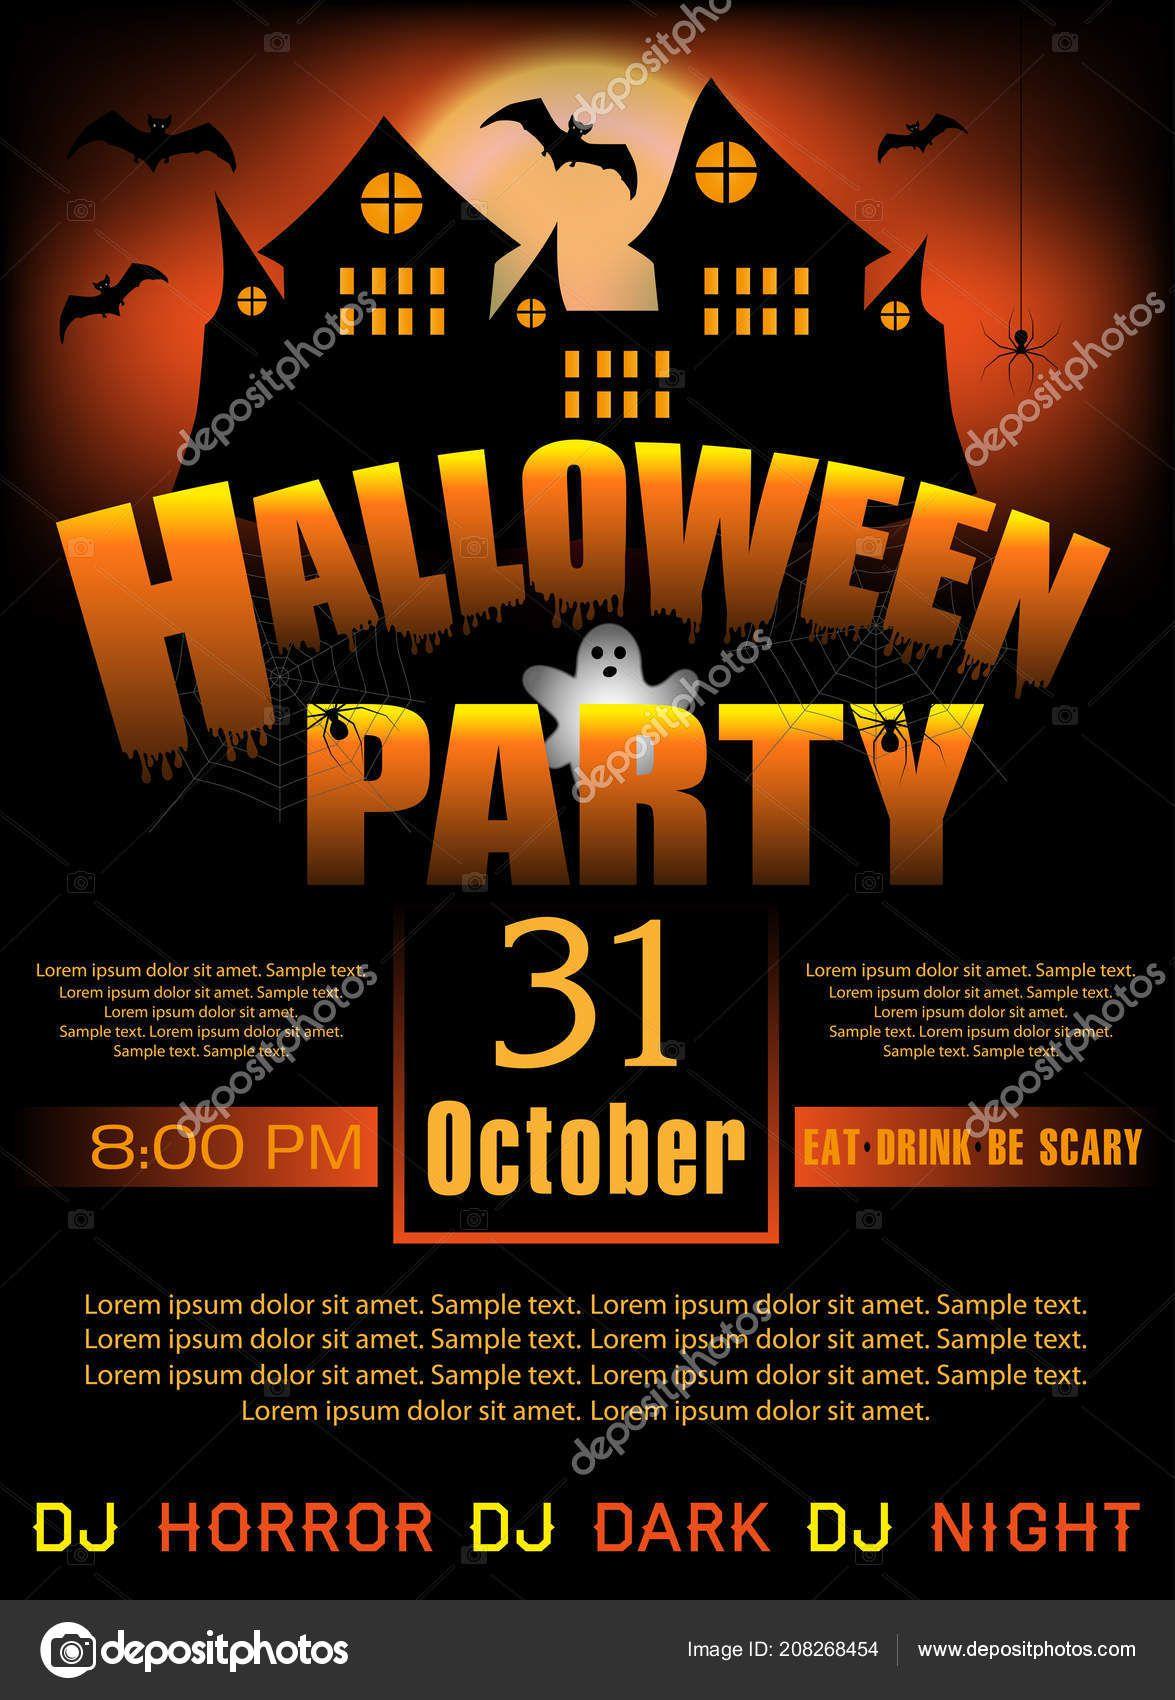 007 Shocking Halloween Party Invitation Template Image  Microsoft Block OctoberFull